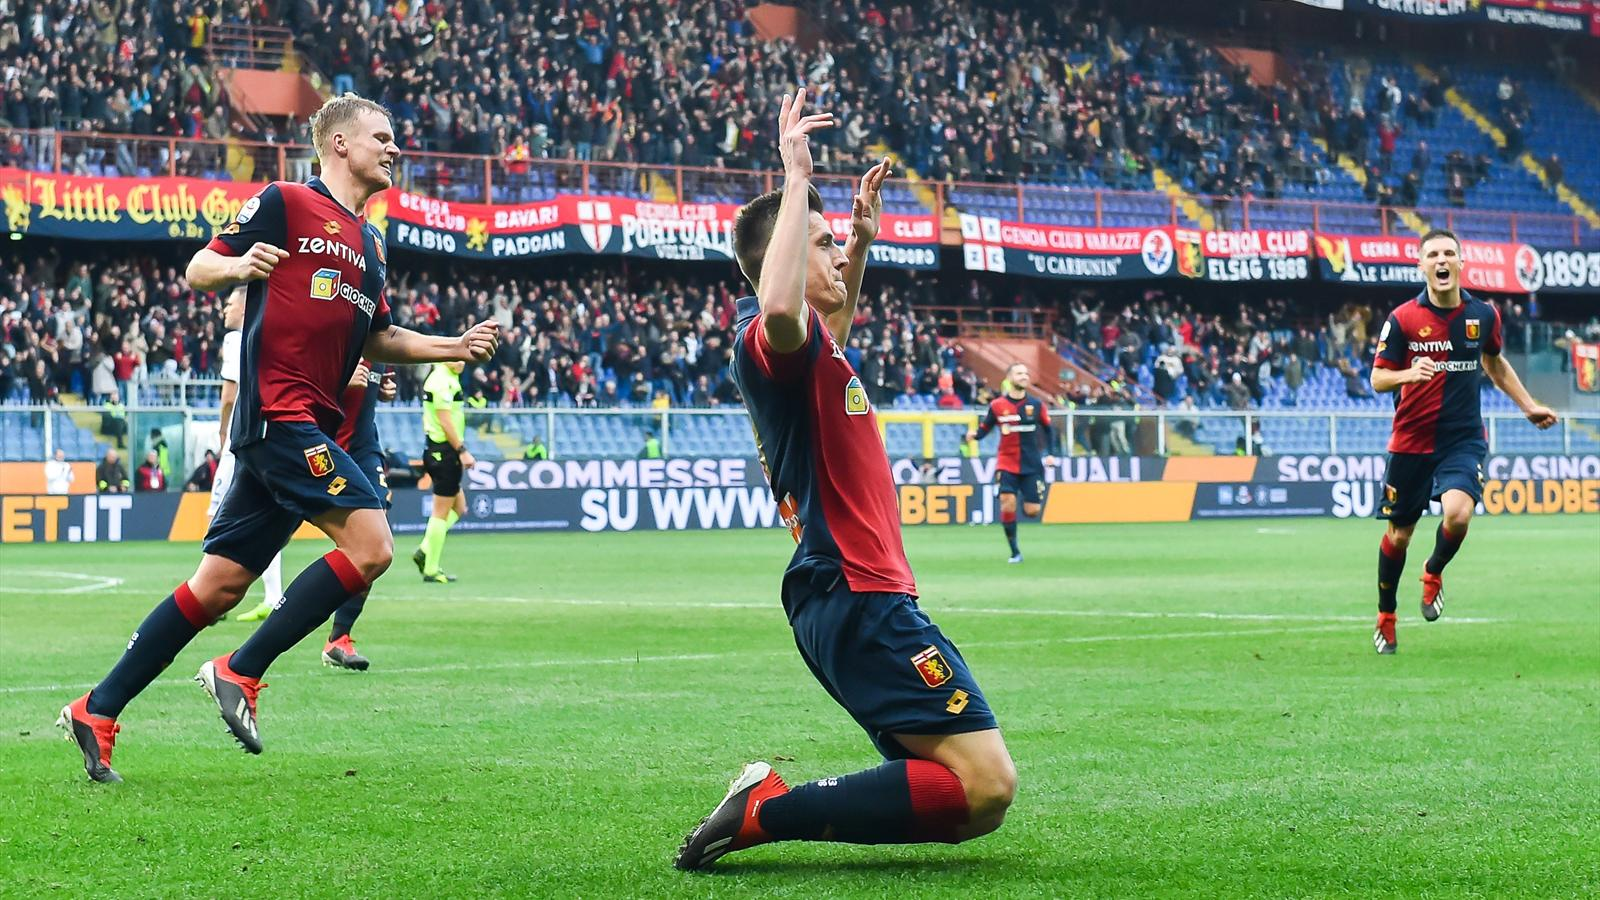 Le pagelle di Genoa-Atalanta 3-1